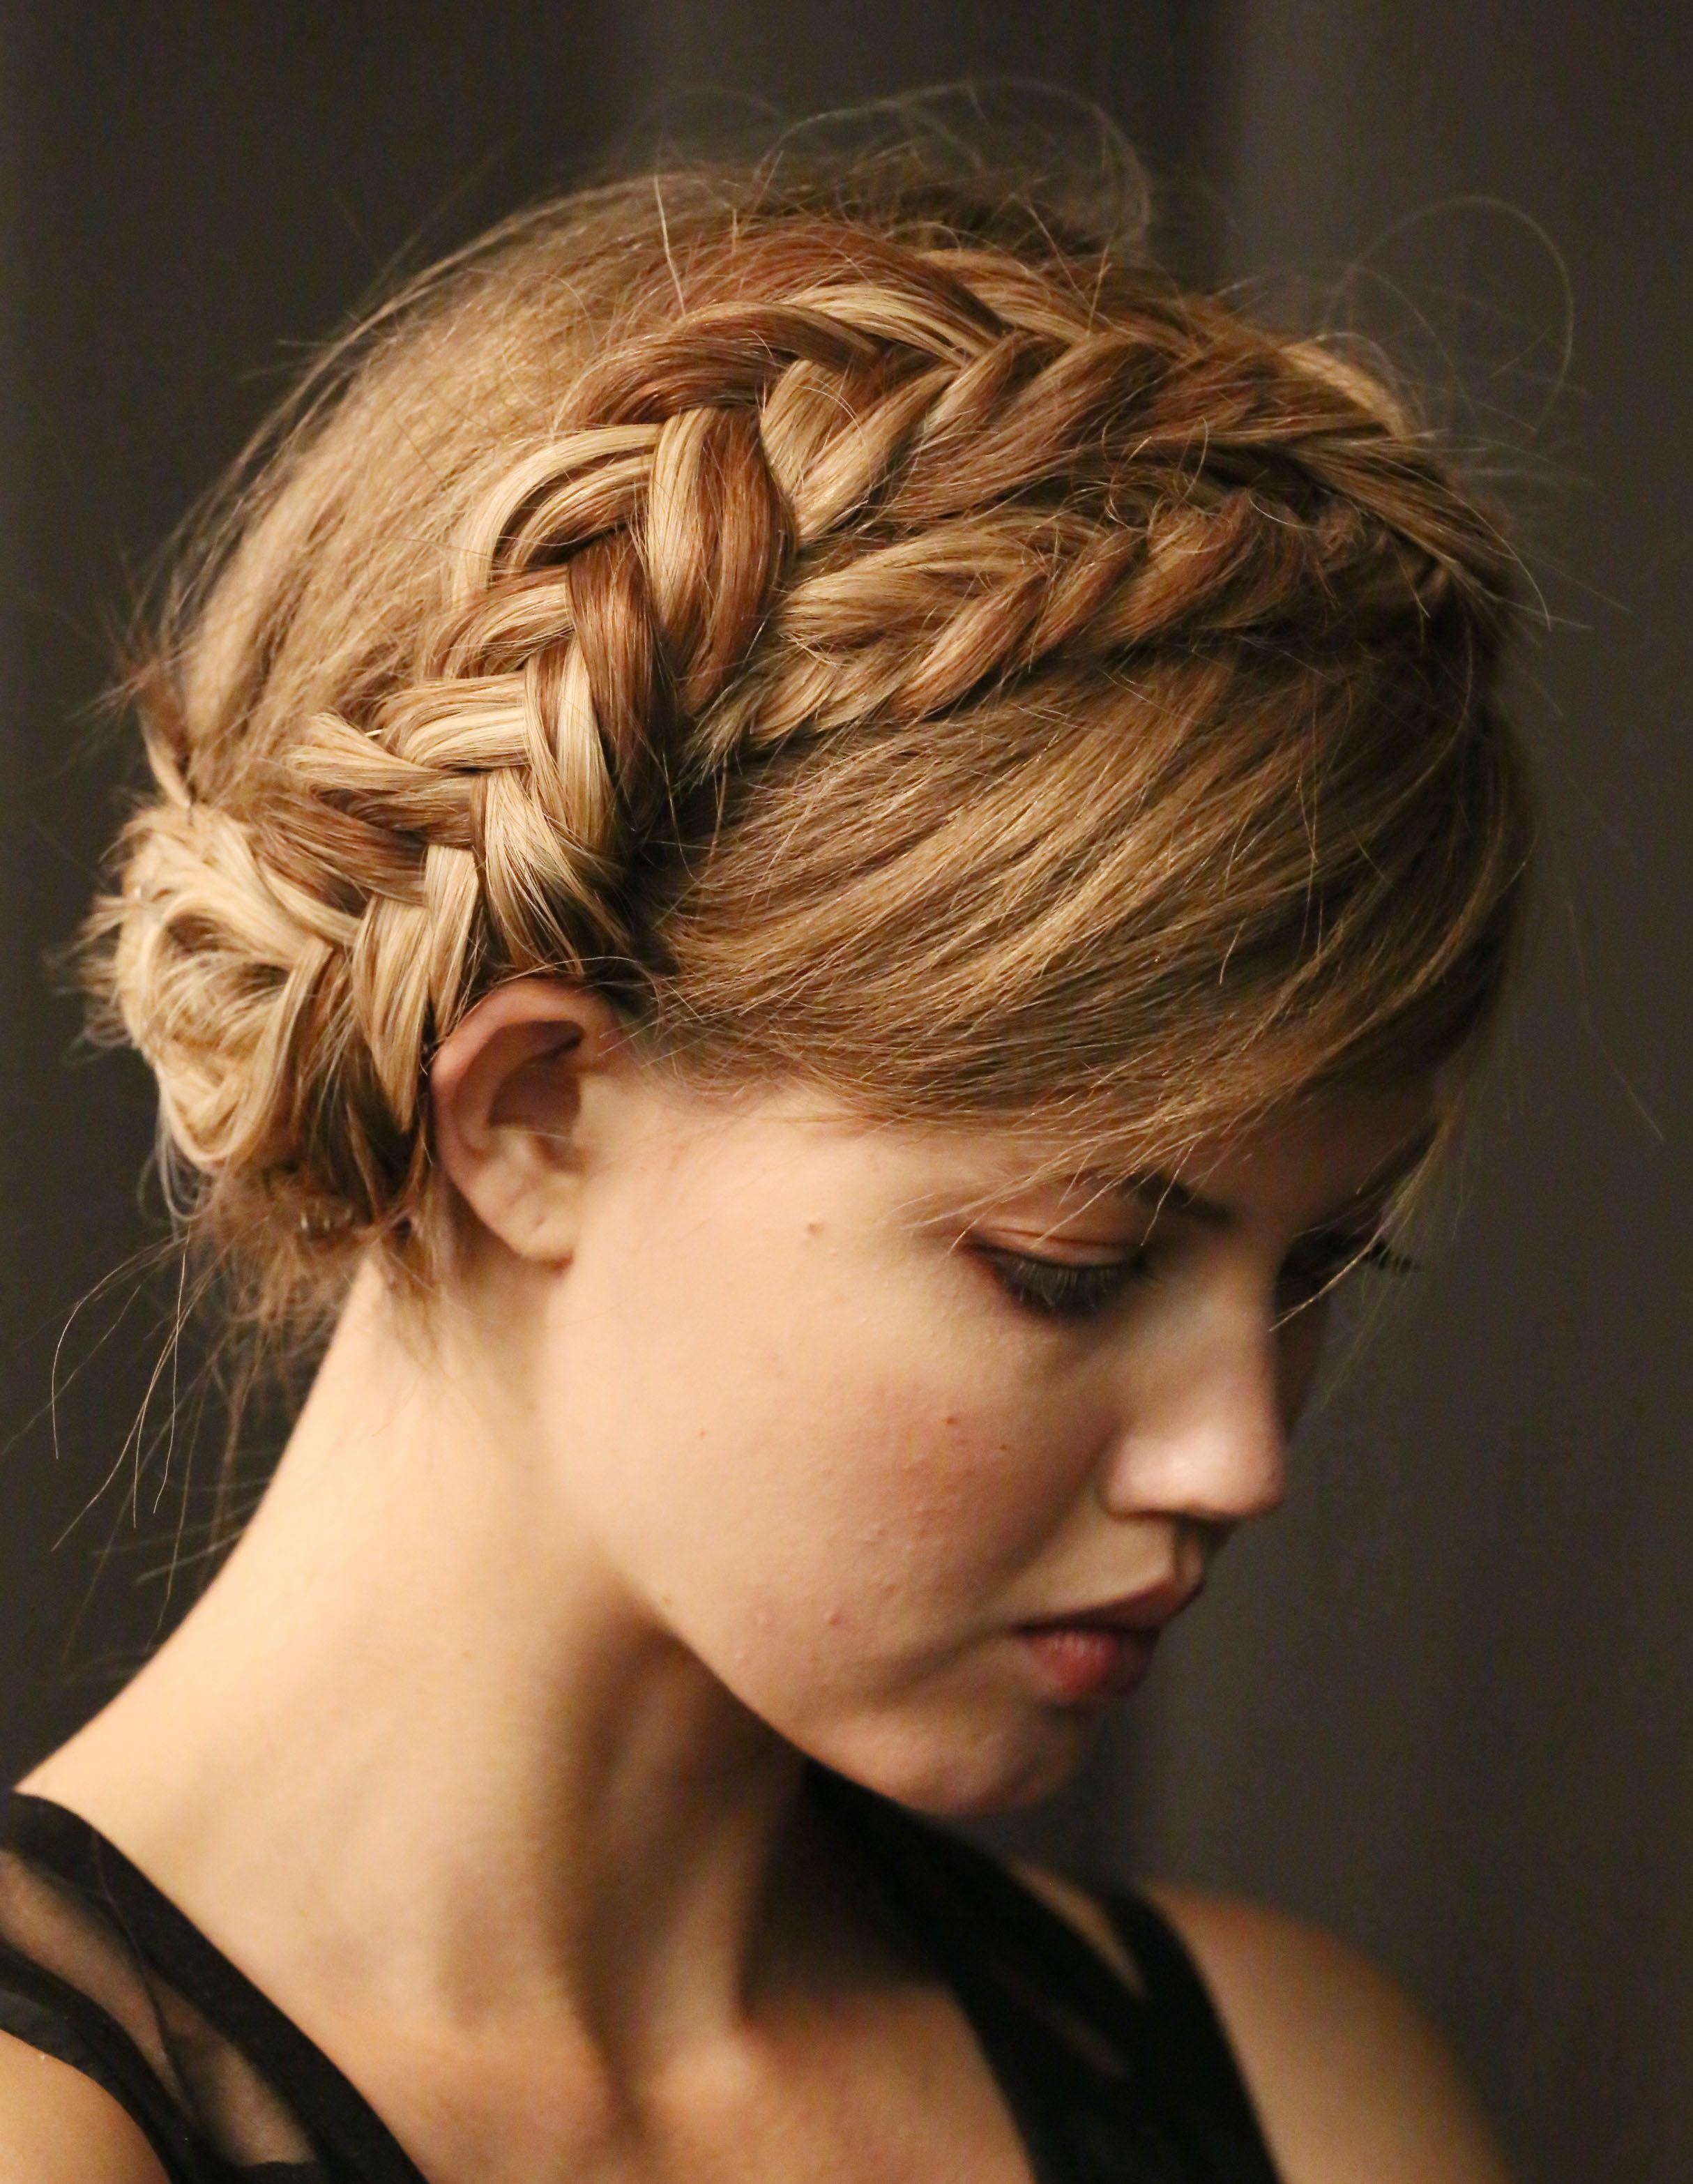 Crown Braid With Bangs Pretty Hairstyles Long Hair Styles